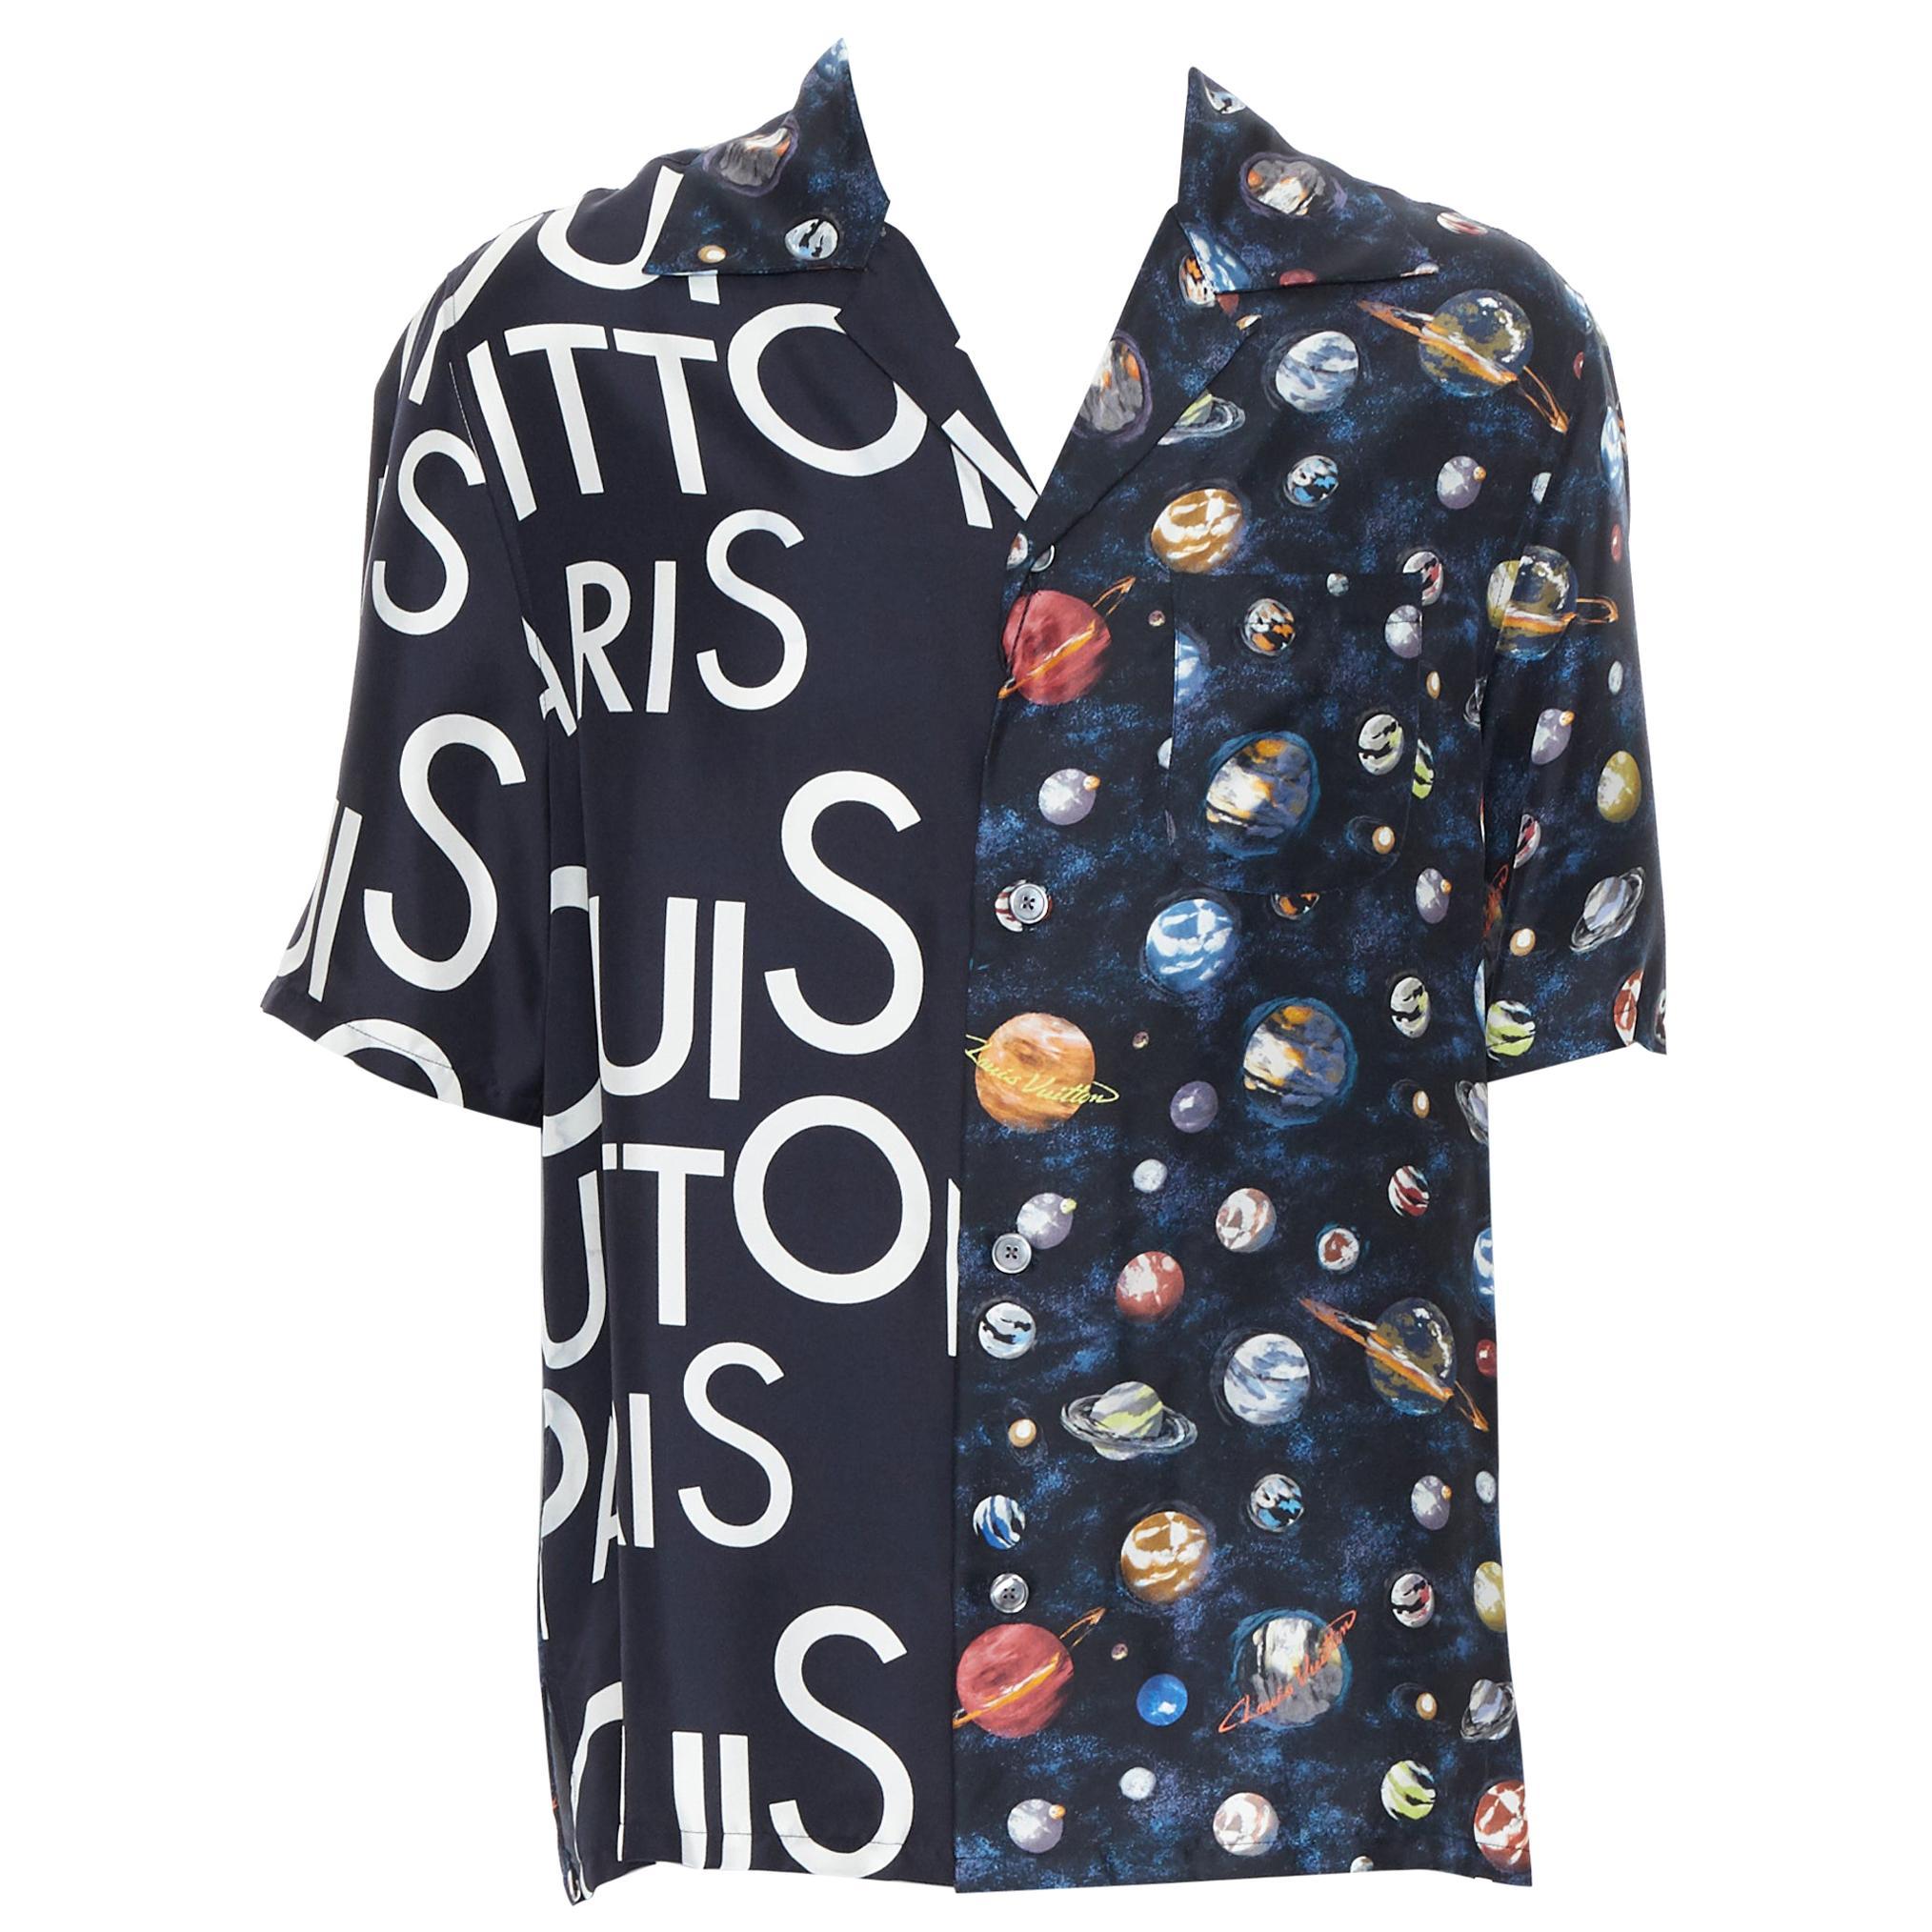 new LOUIS VUITTON Split Galaxy print short sleeve 100% silk hawaiian shirt L